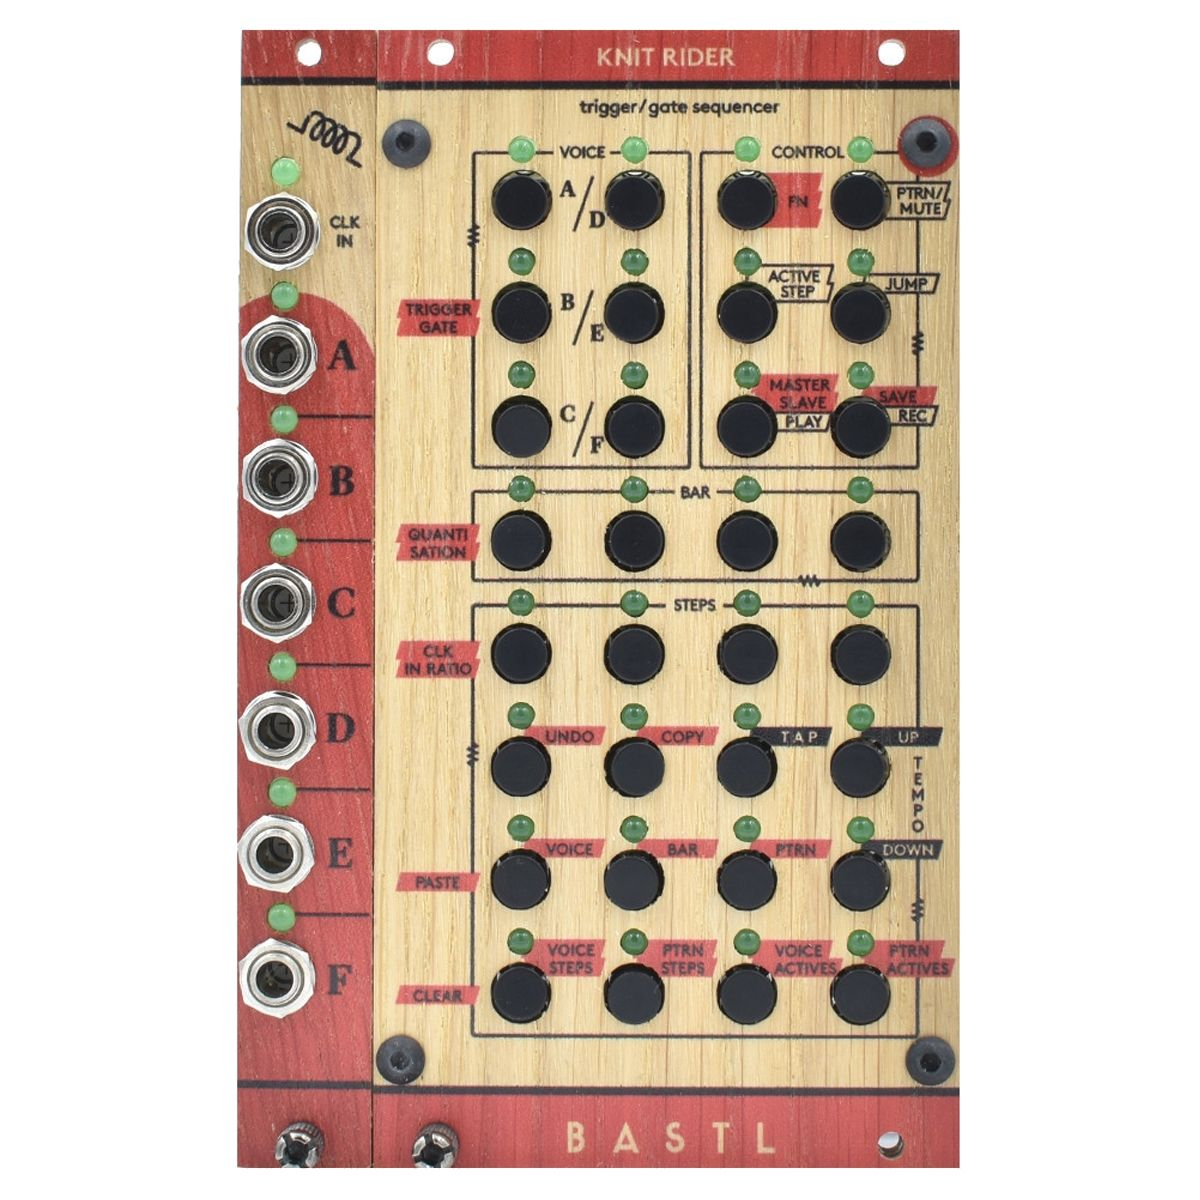 Bastl Instruments Knit Rider Eurorack 6 Channel Gate/Trigger Sequencer Module (Wood)